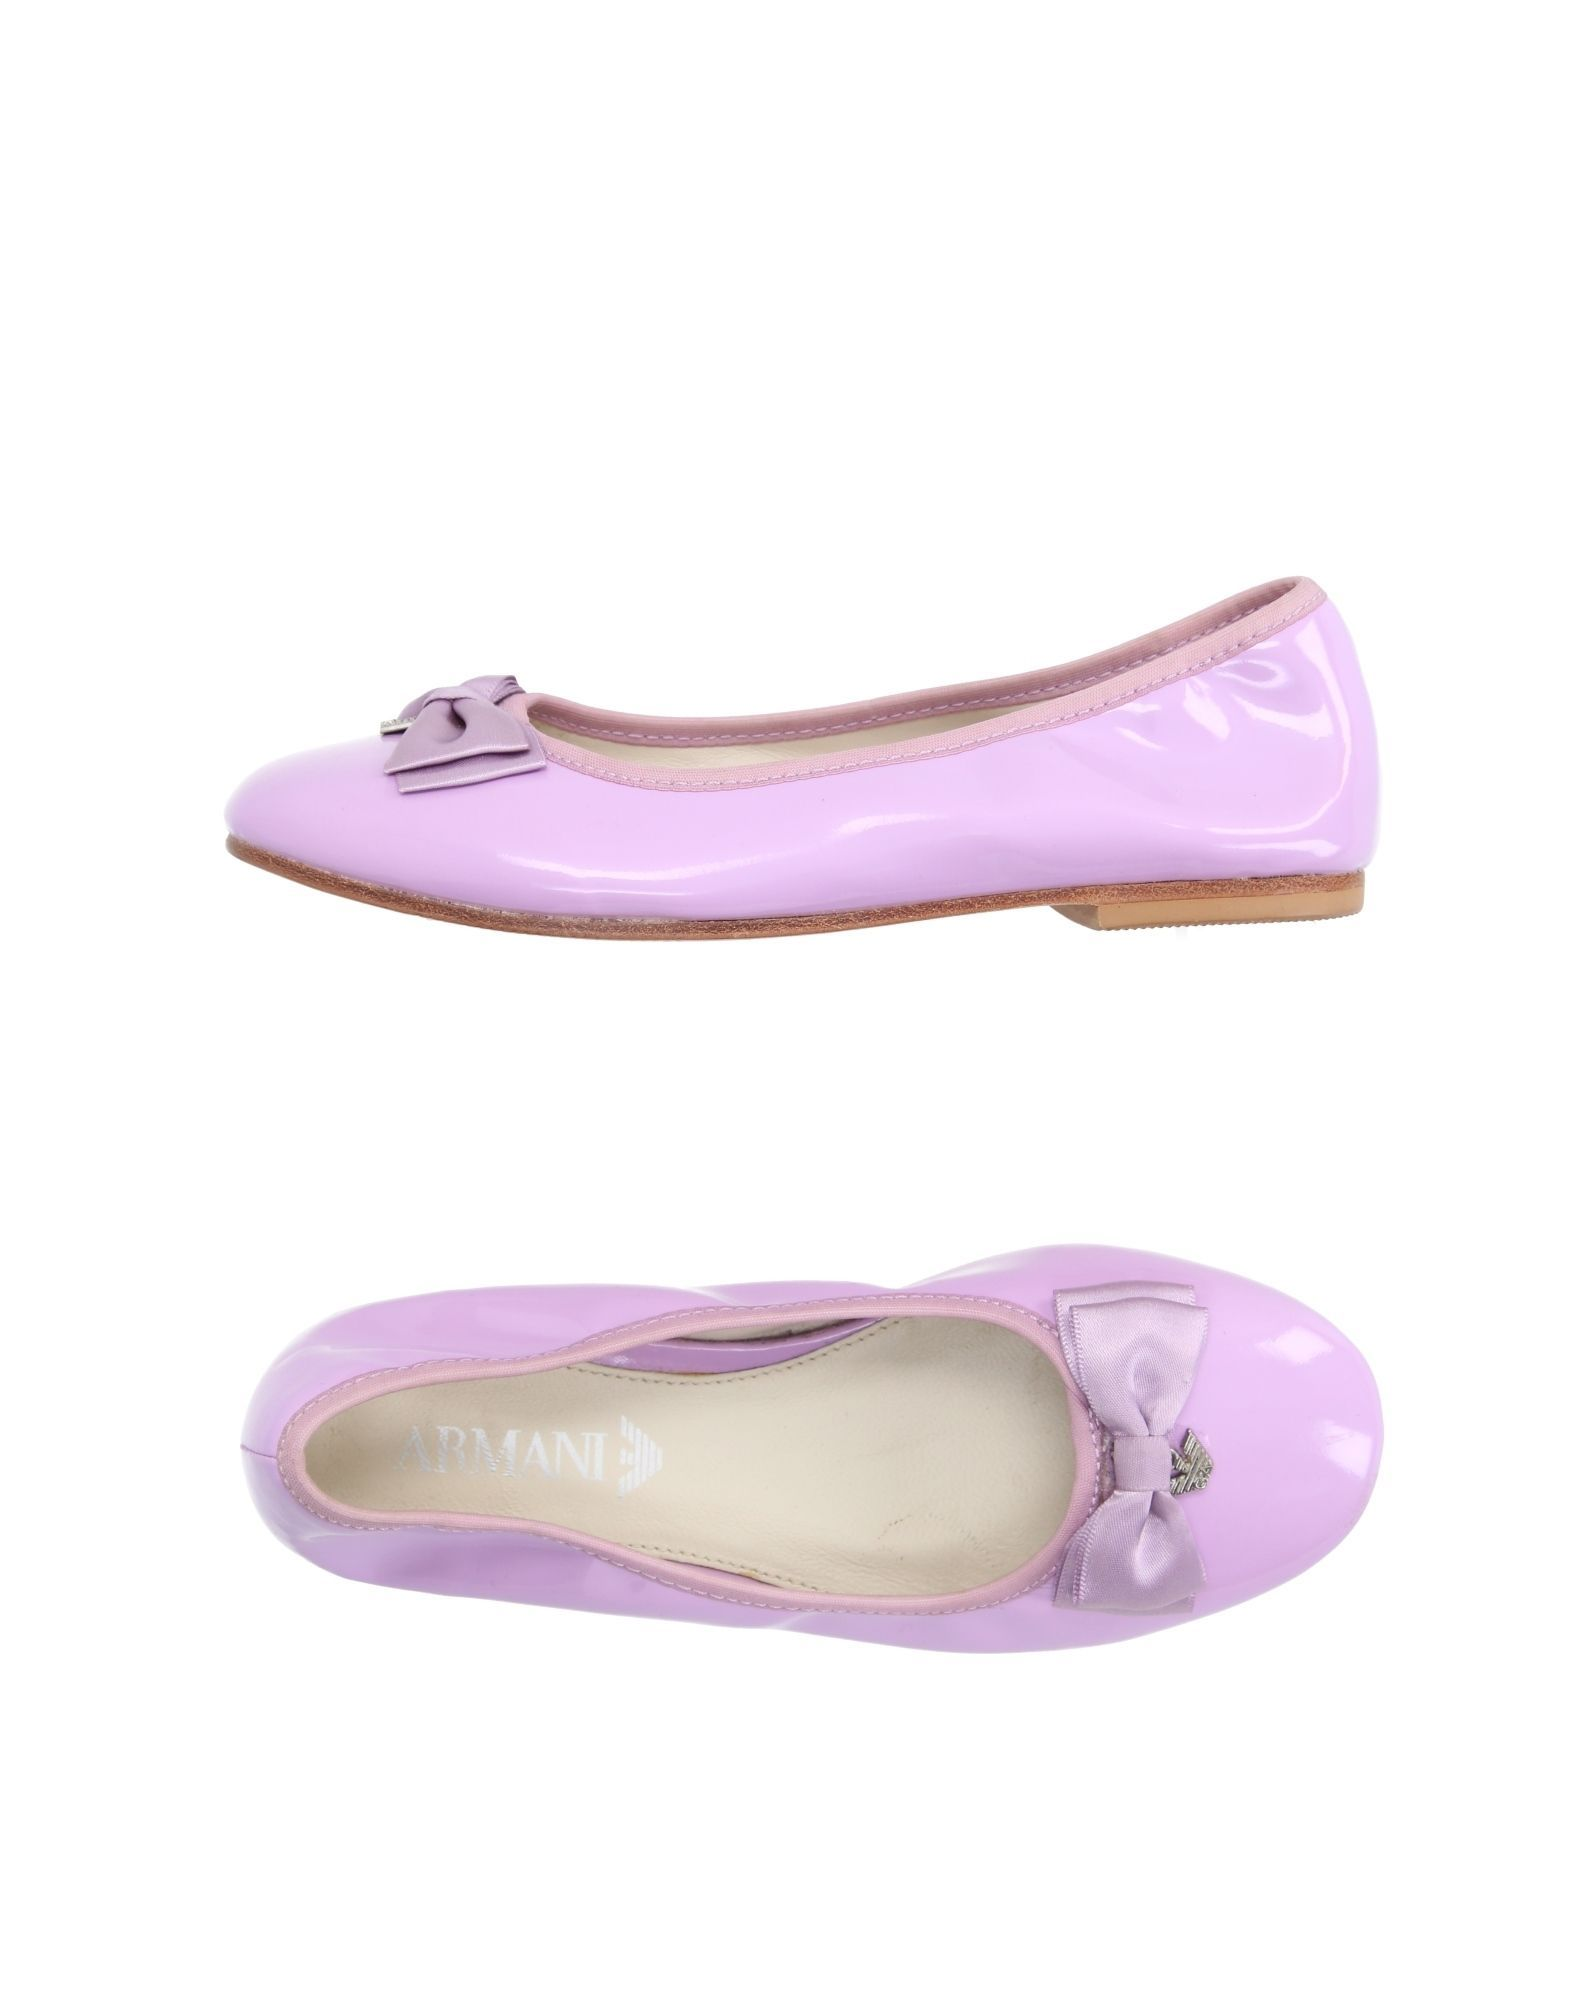 FOOTWEAR Armani Junior Lilac Girl Leather